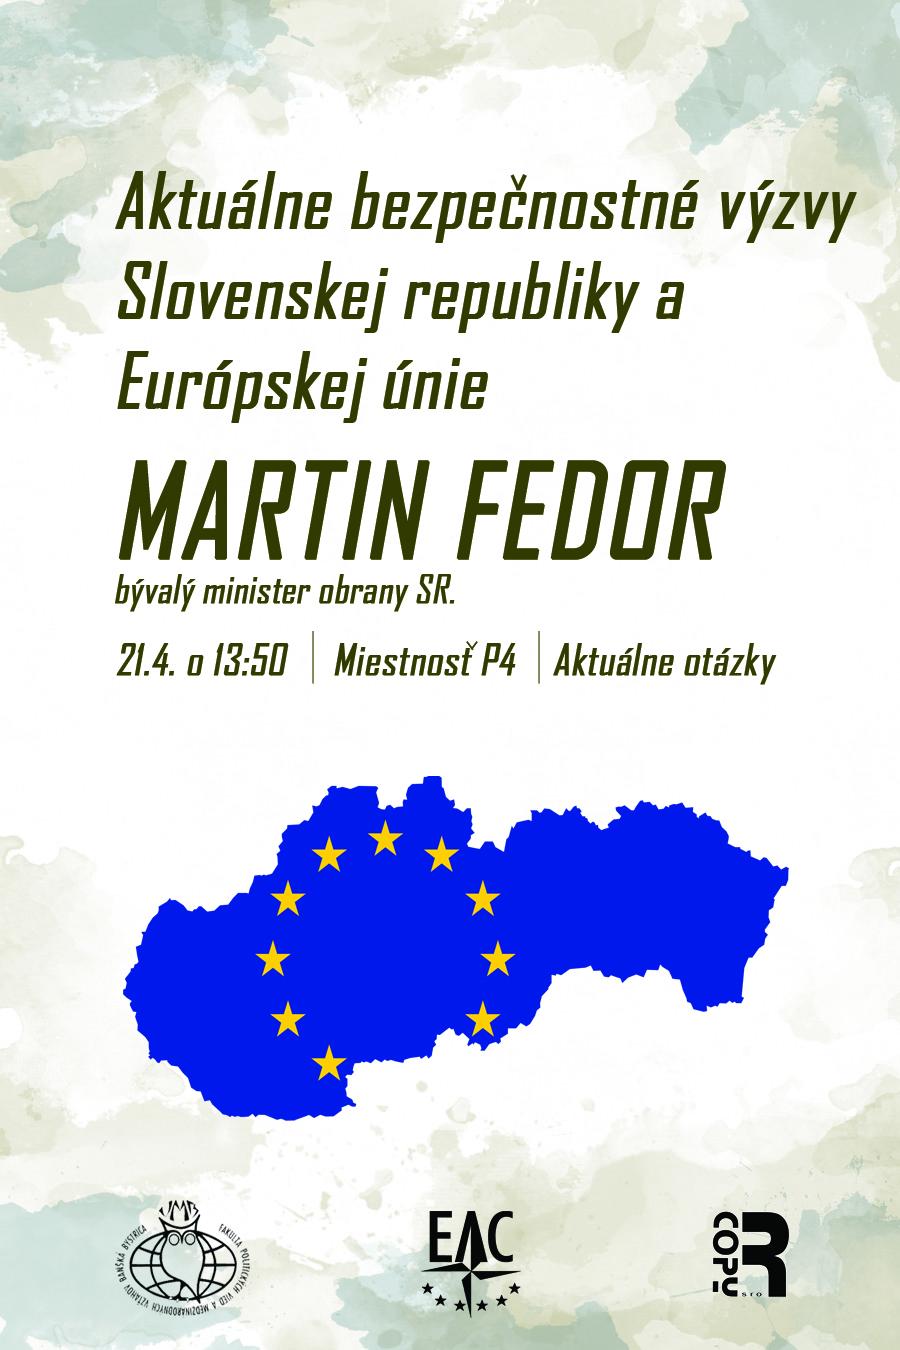 Martin fedor poster